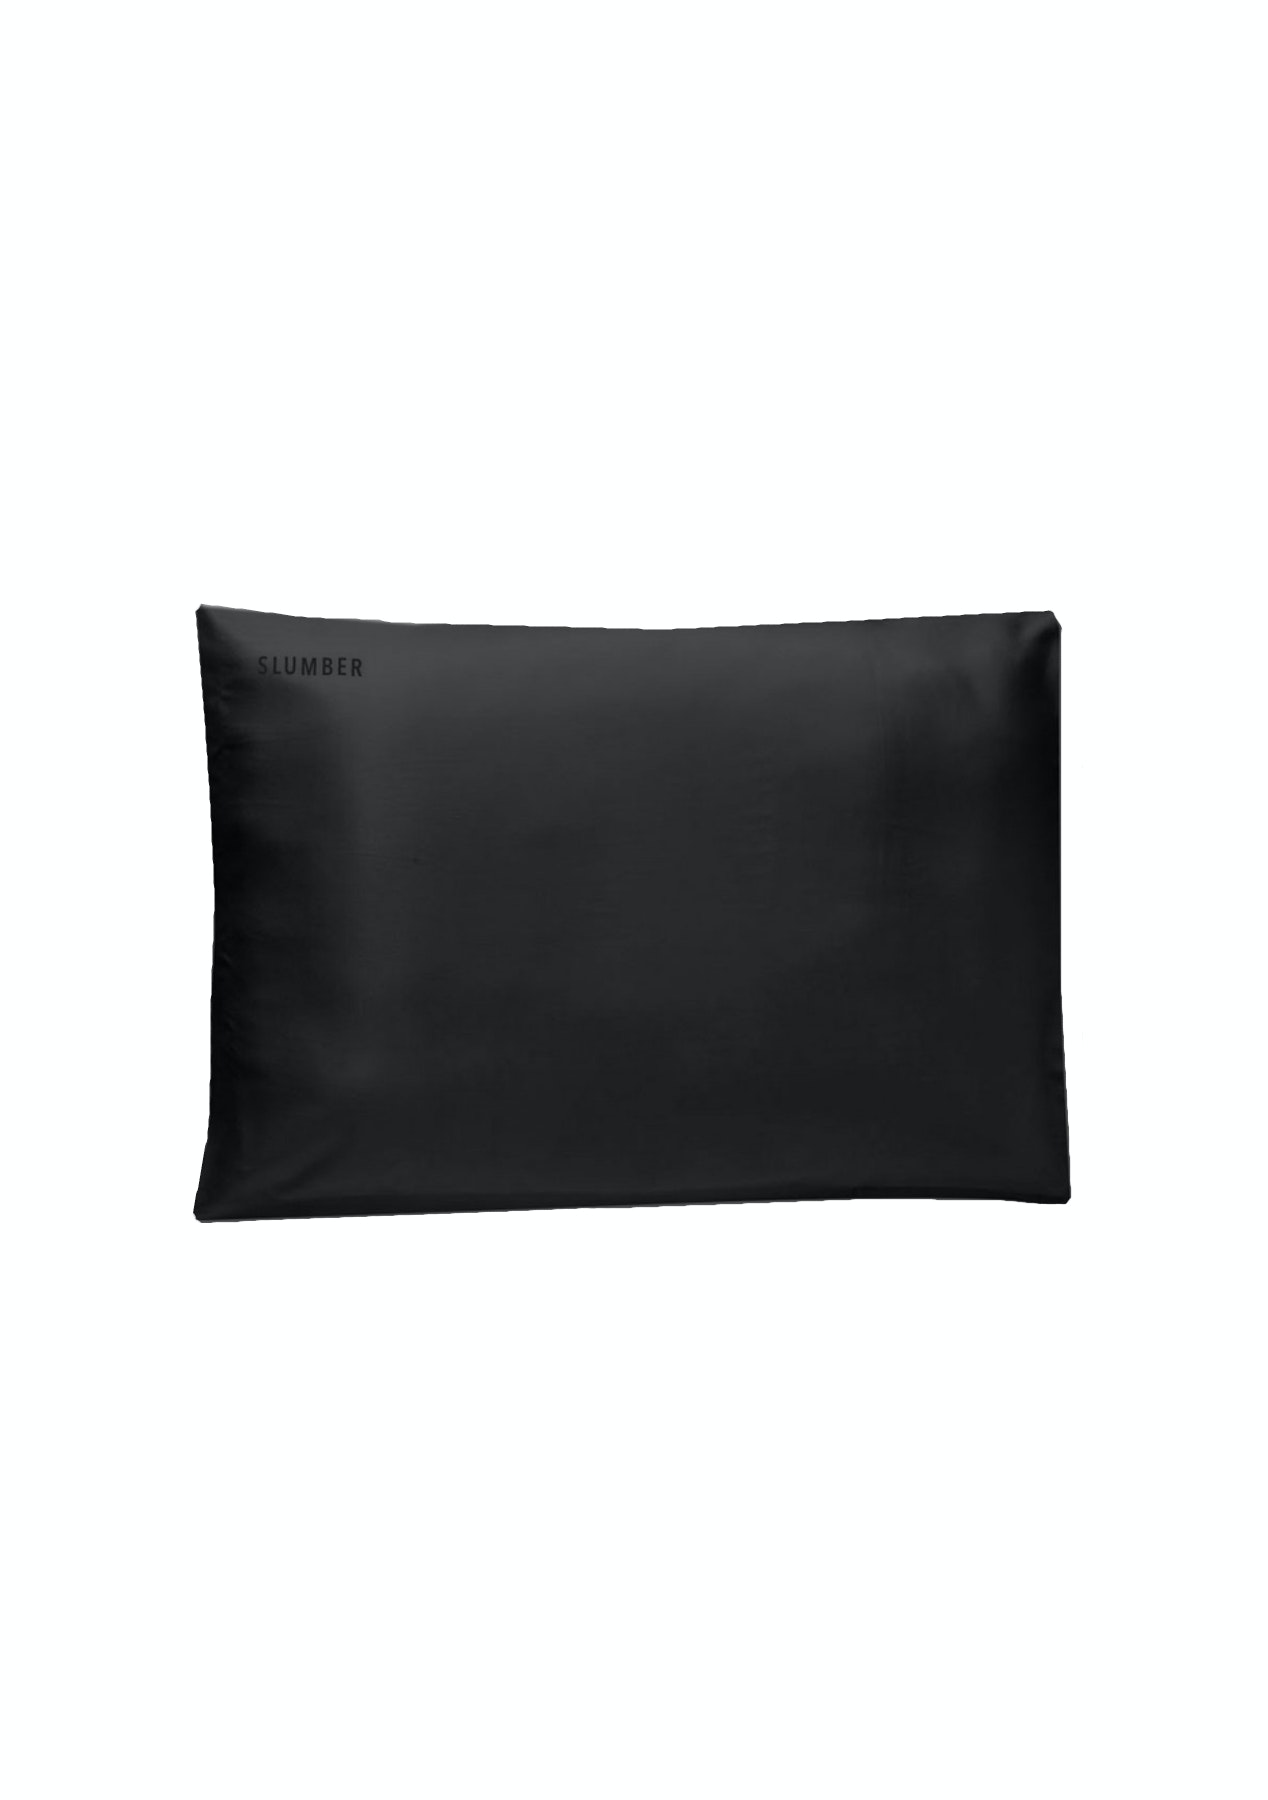 SLUMBER 100%  SILK PILLOWCASE - TWO PACK - Black